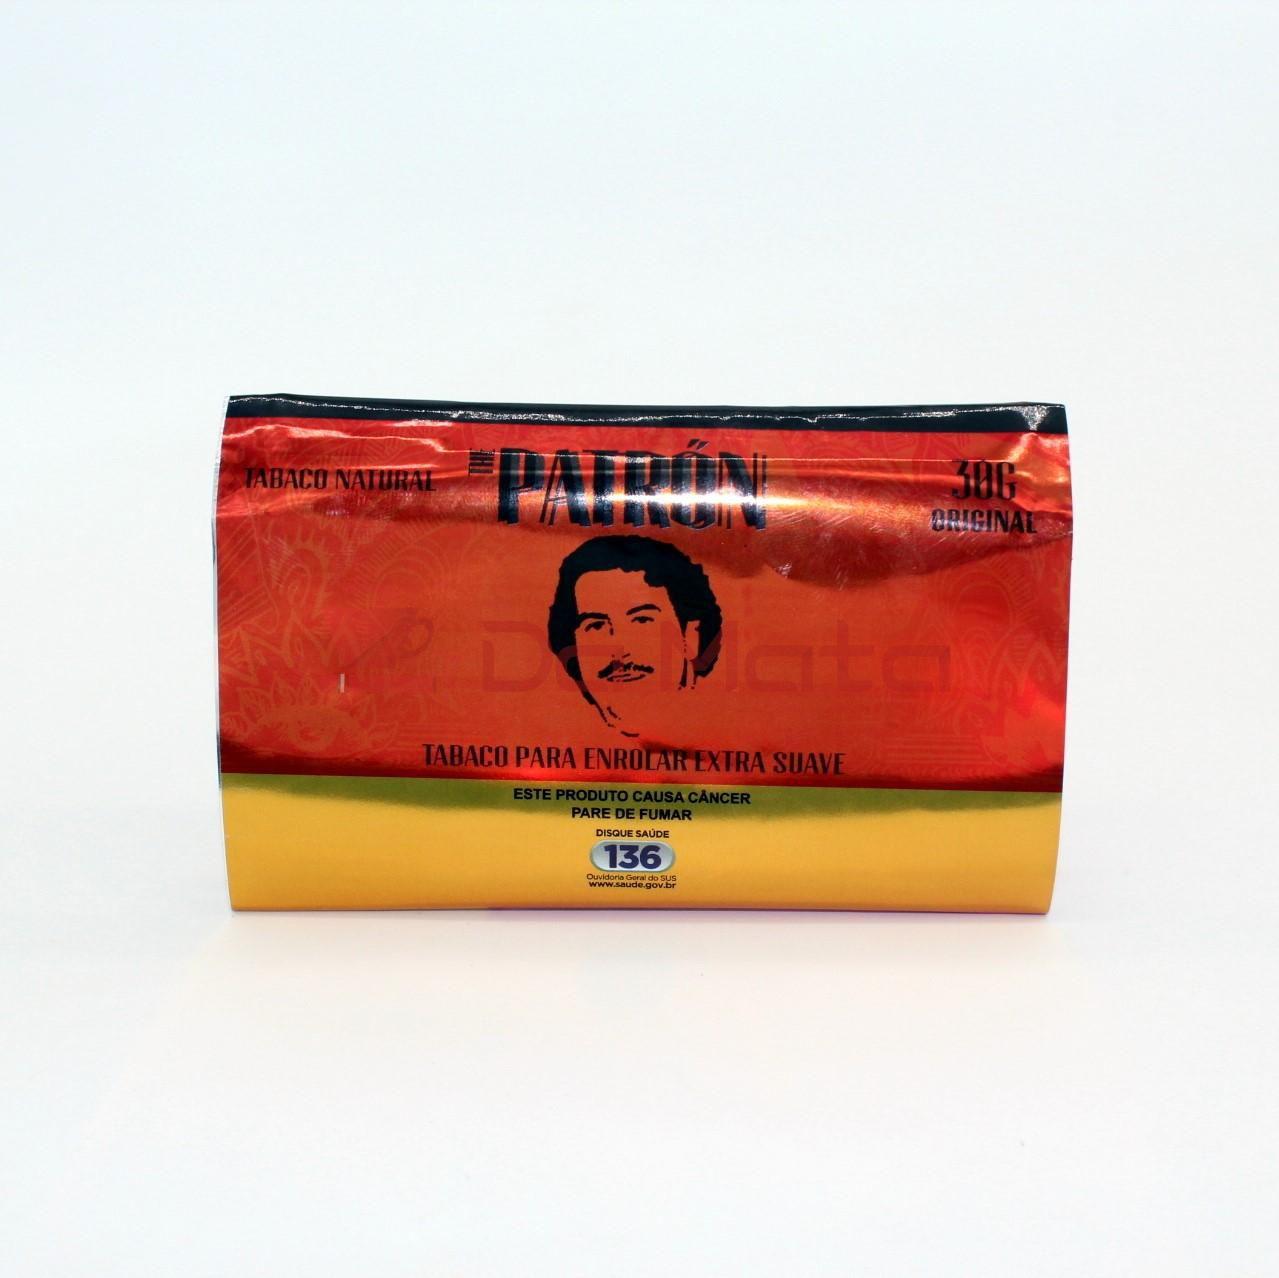 Tabaco The patron - Classico